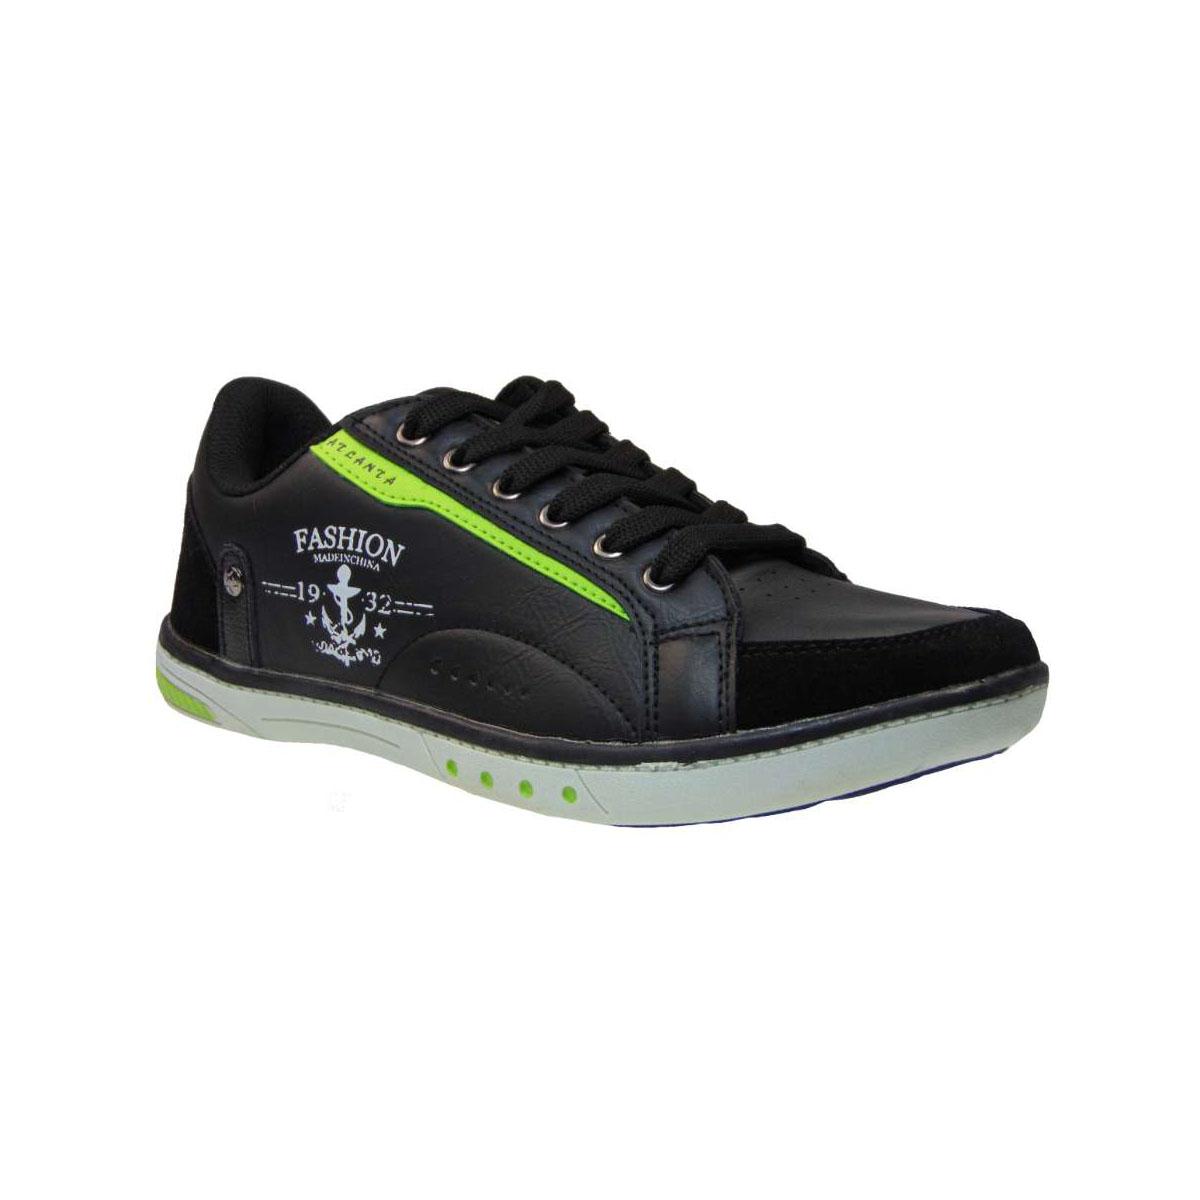 4ad15699fac Atlanta 15K Sneaker Απο Συνθετικό Αδιάβροχο Δέρμα Μαύρο | Tsimpolis.gr